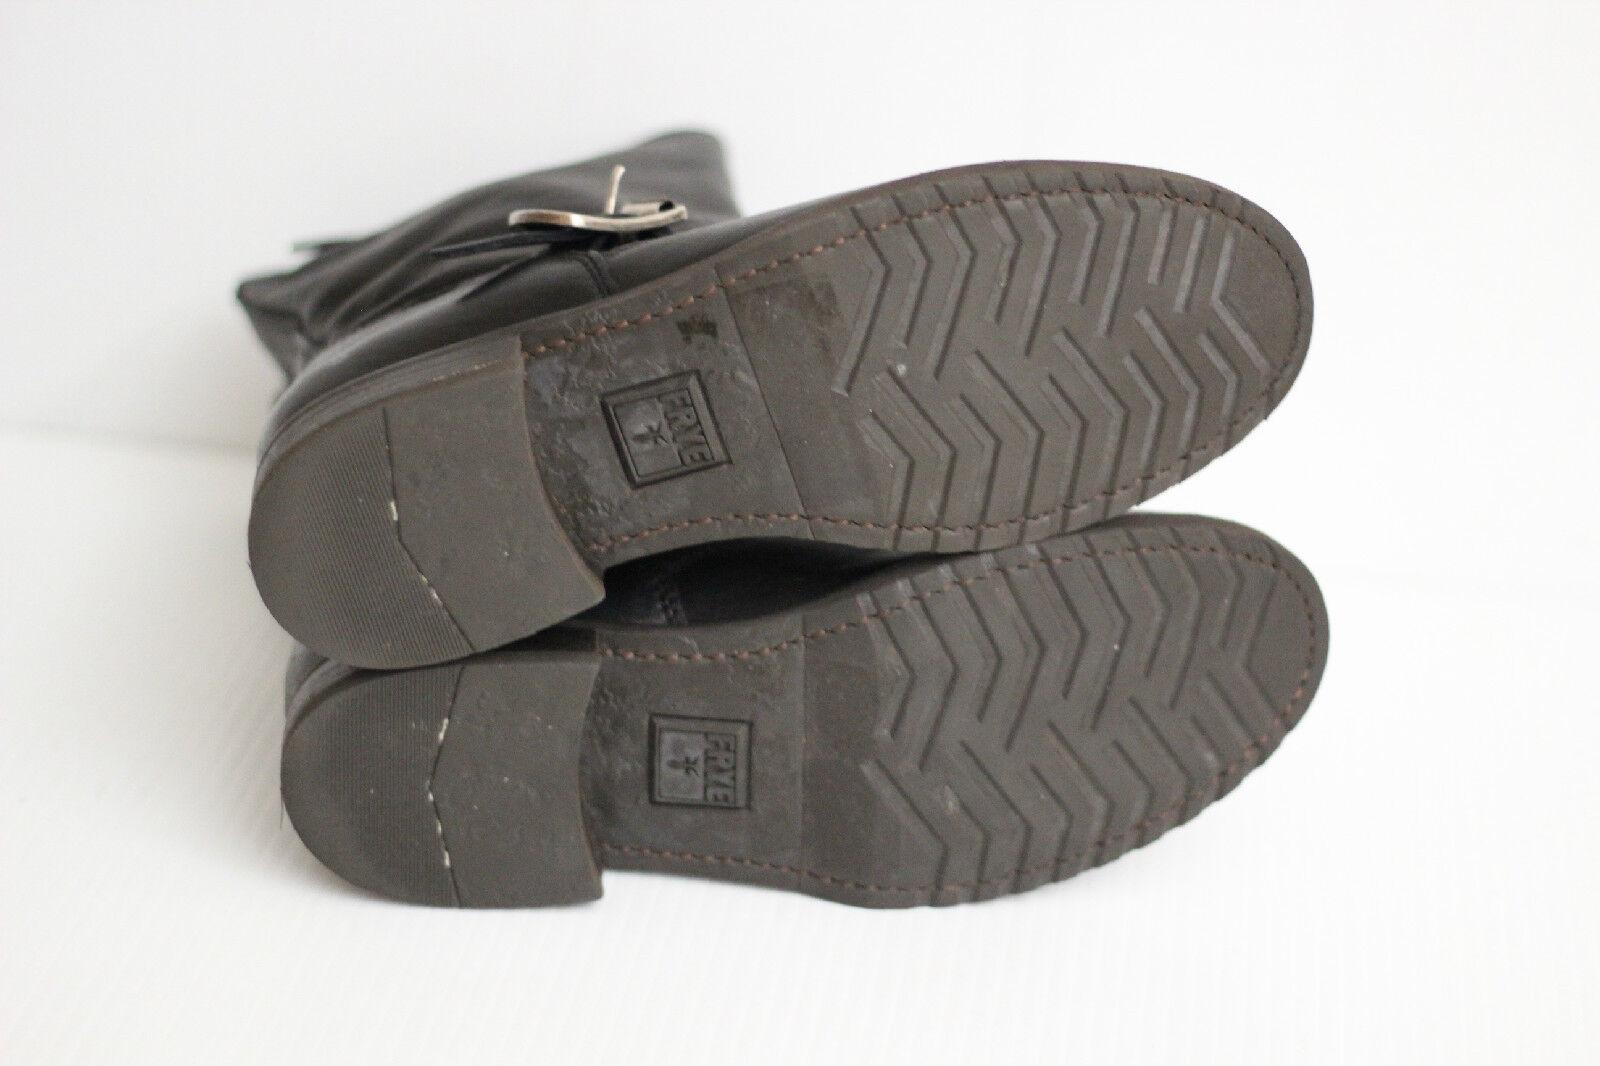 Frye 'Veronica' Short Moto Biker Leather Boot - Black - - - Size 6 B (Y36) 1d1879